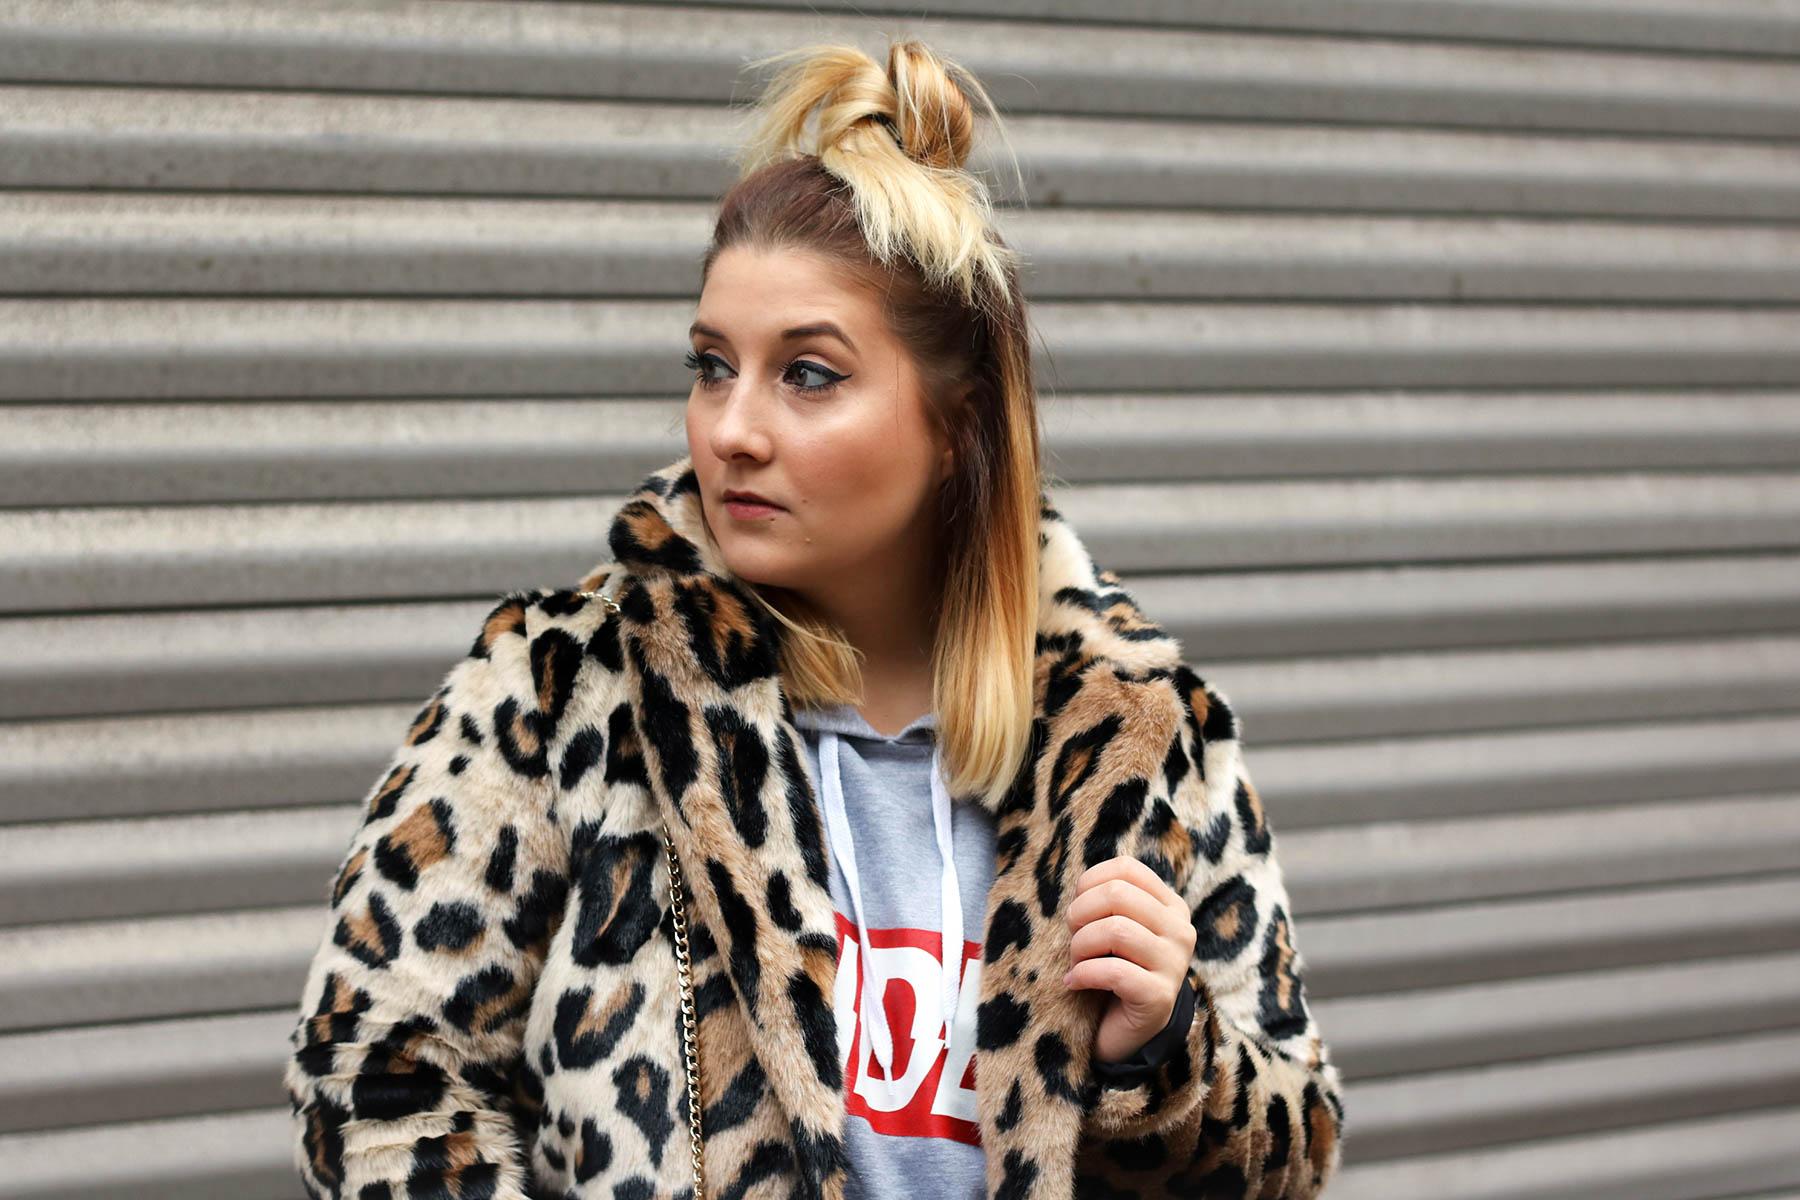 outfit-modeblog-fashionblog-fashionpassionlove-leo-mantel-trend-mantel-winter-sneaker-adidas3 (1 von 1)